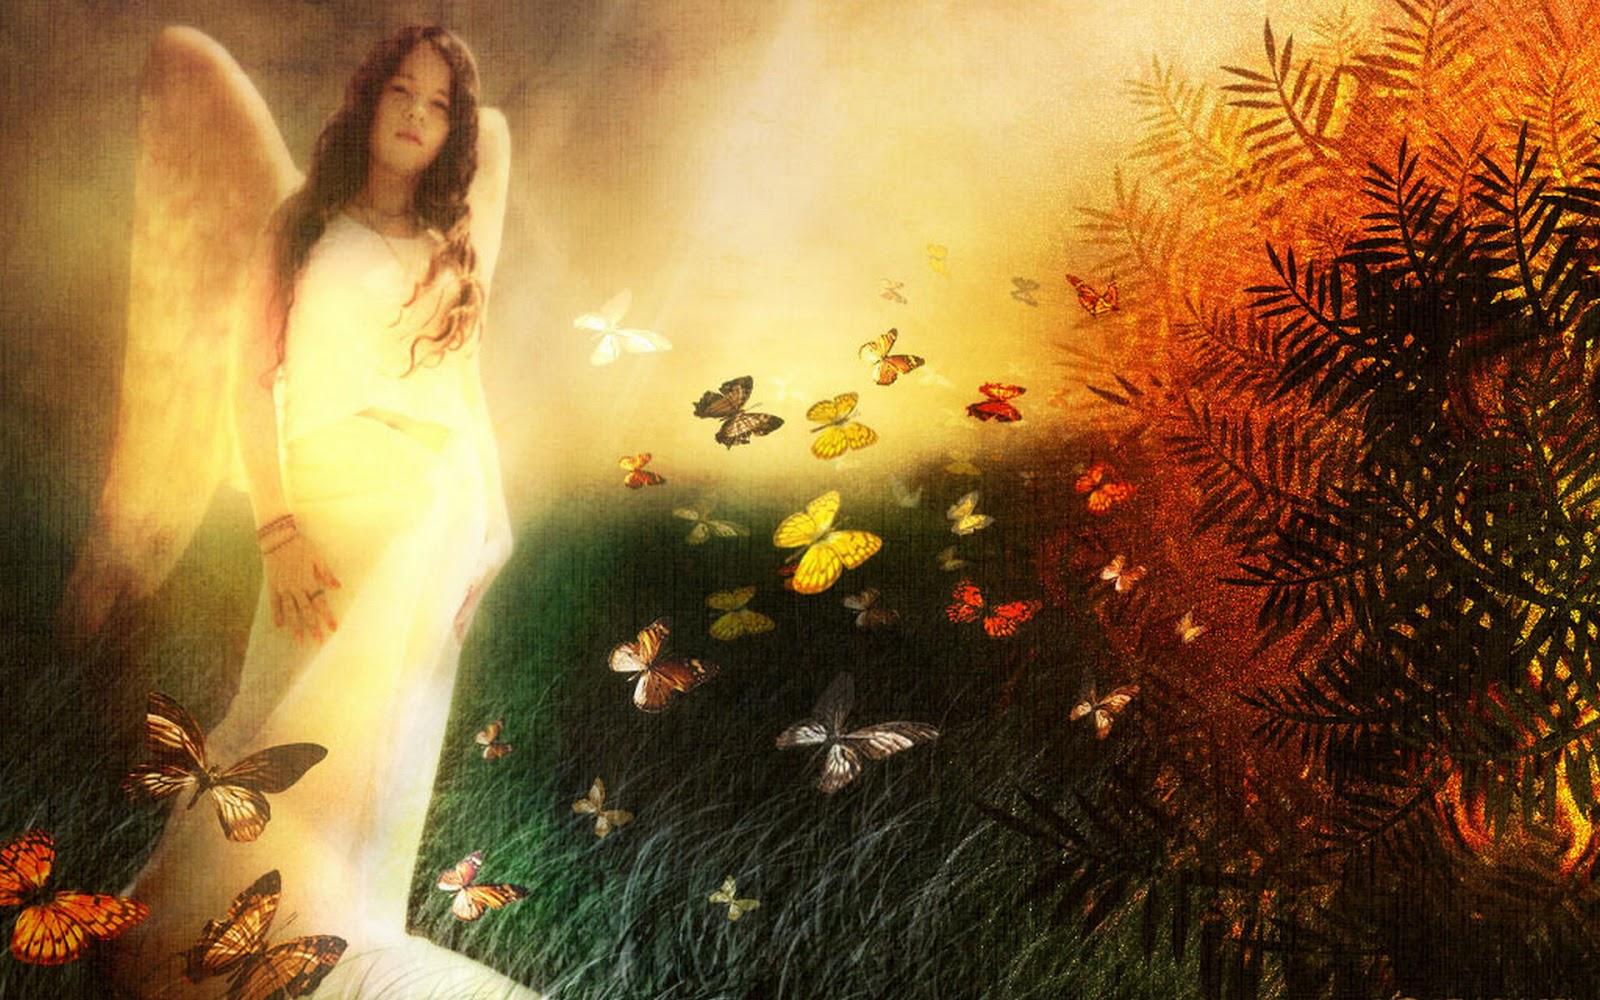 Fantasy Angel Photoshop Designs HD wallpapers 1920x1200 1600x1000